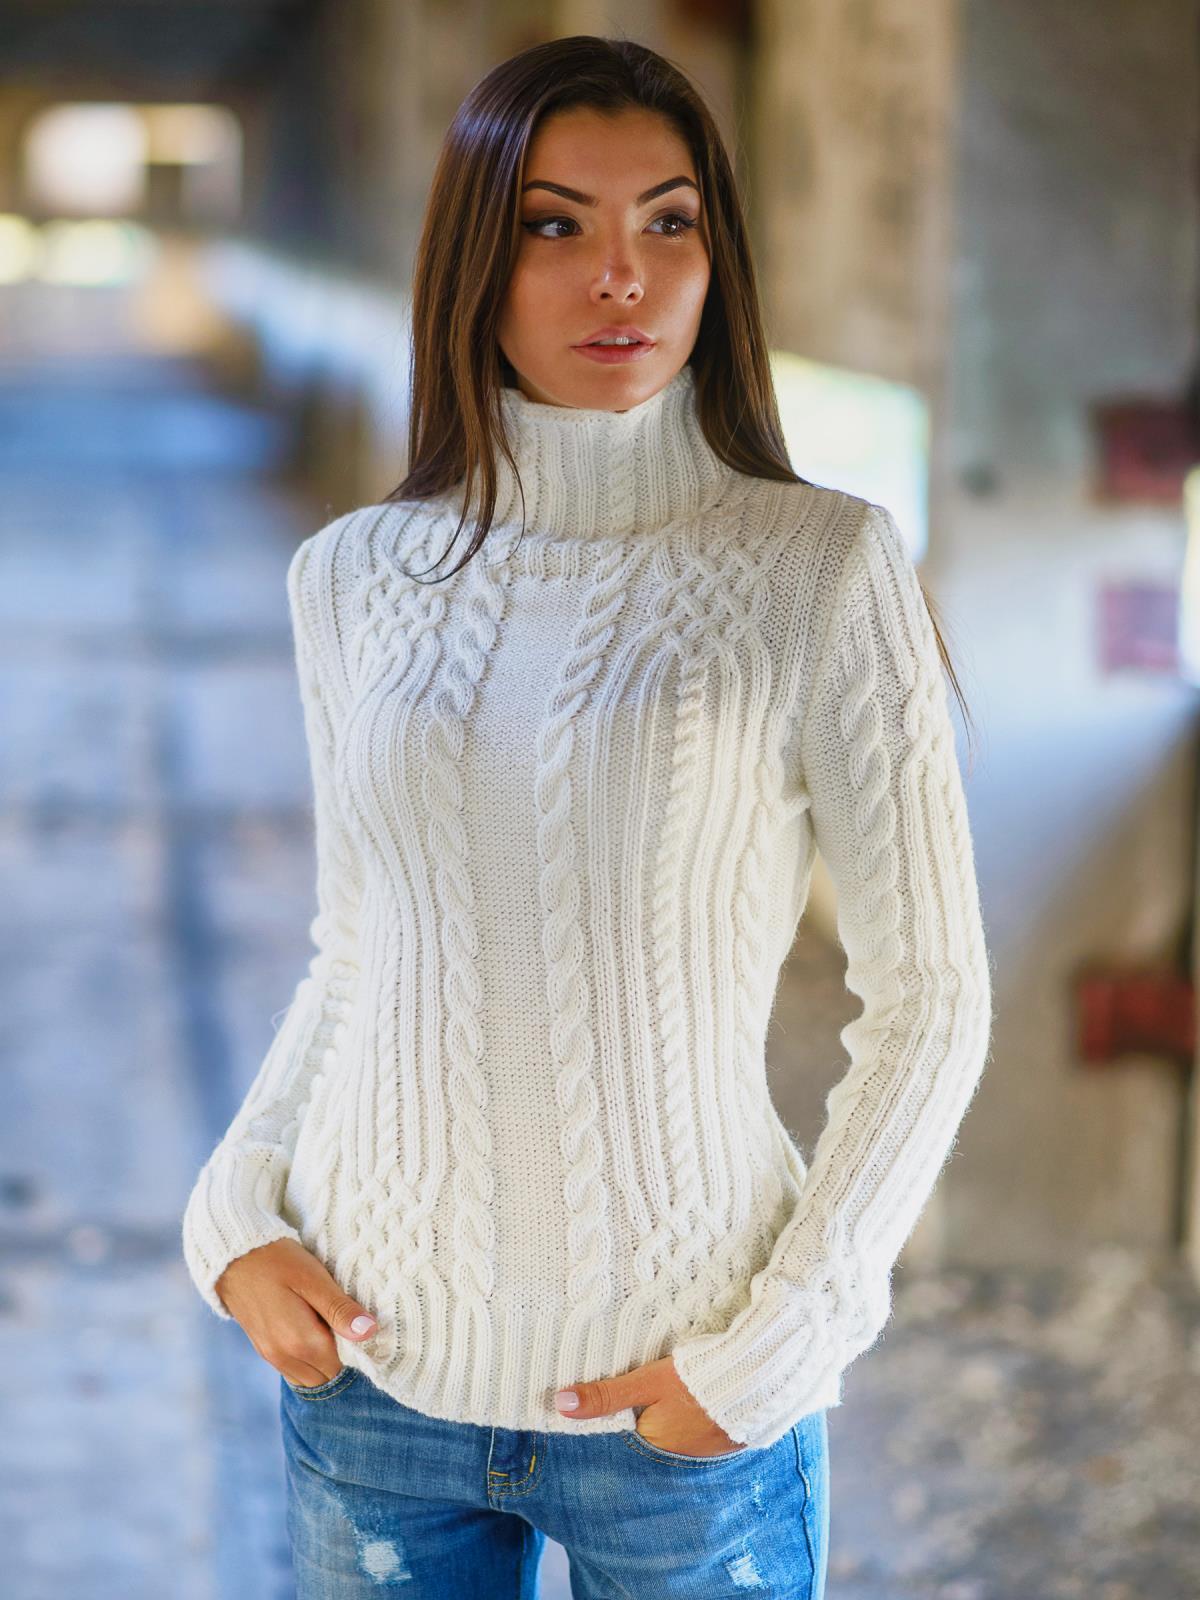 a6595ab92ac0c Свитер 7050/332 (Вязаная одежда, Свитеры, пуловеры)